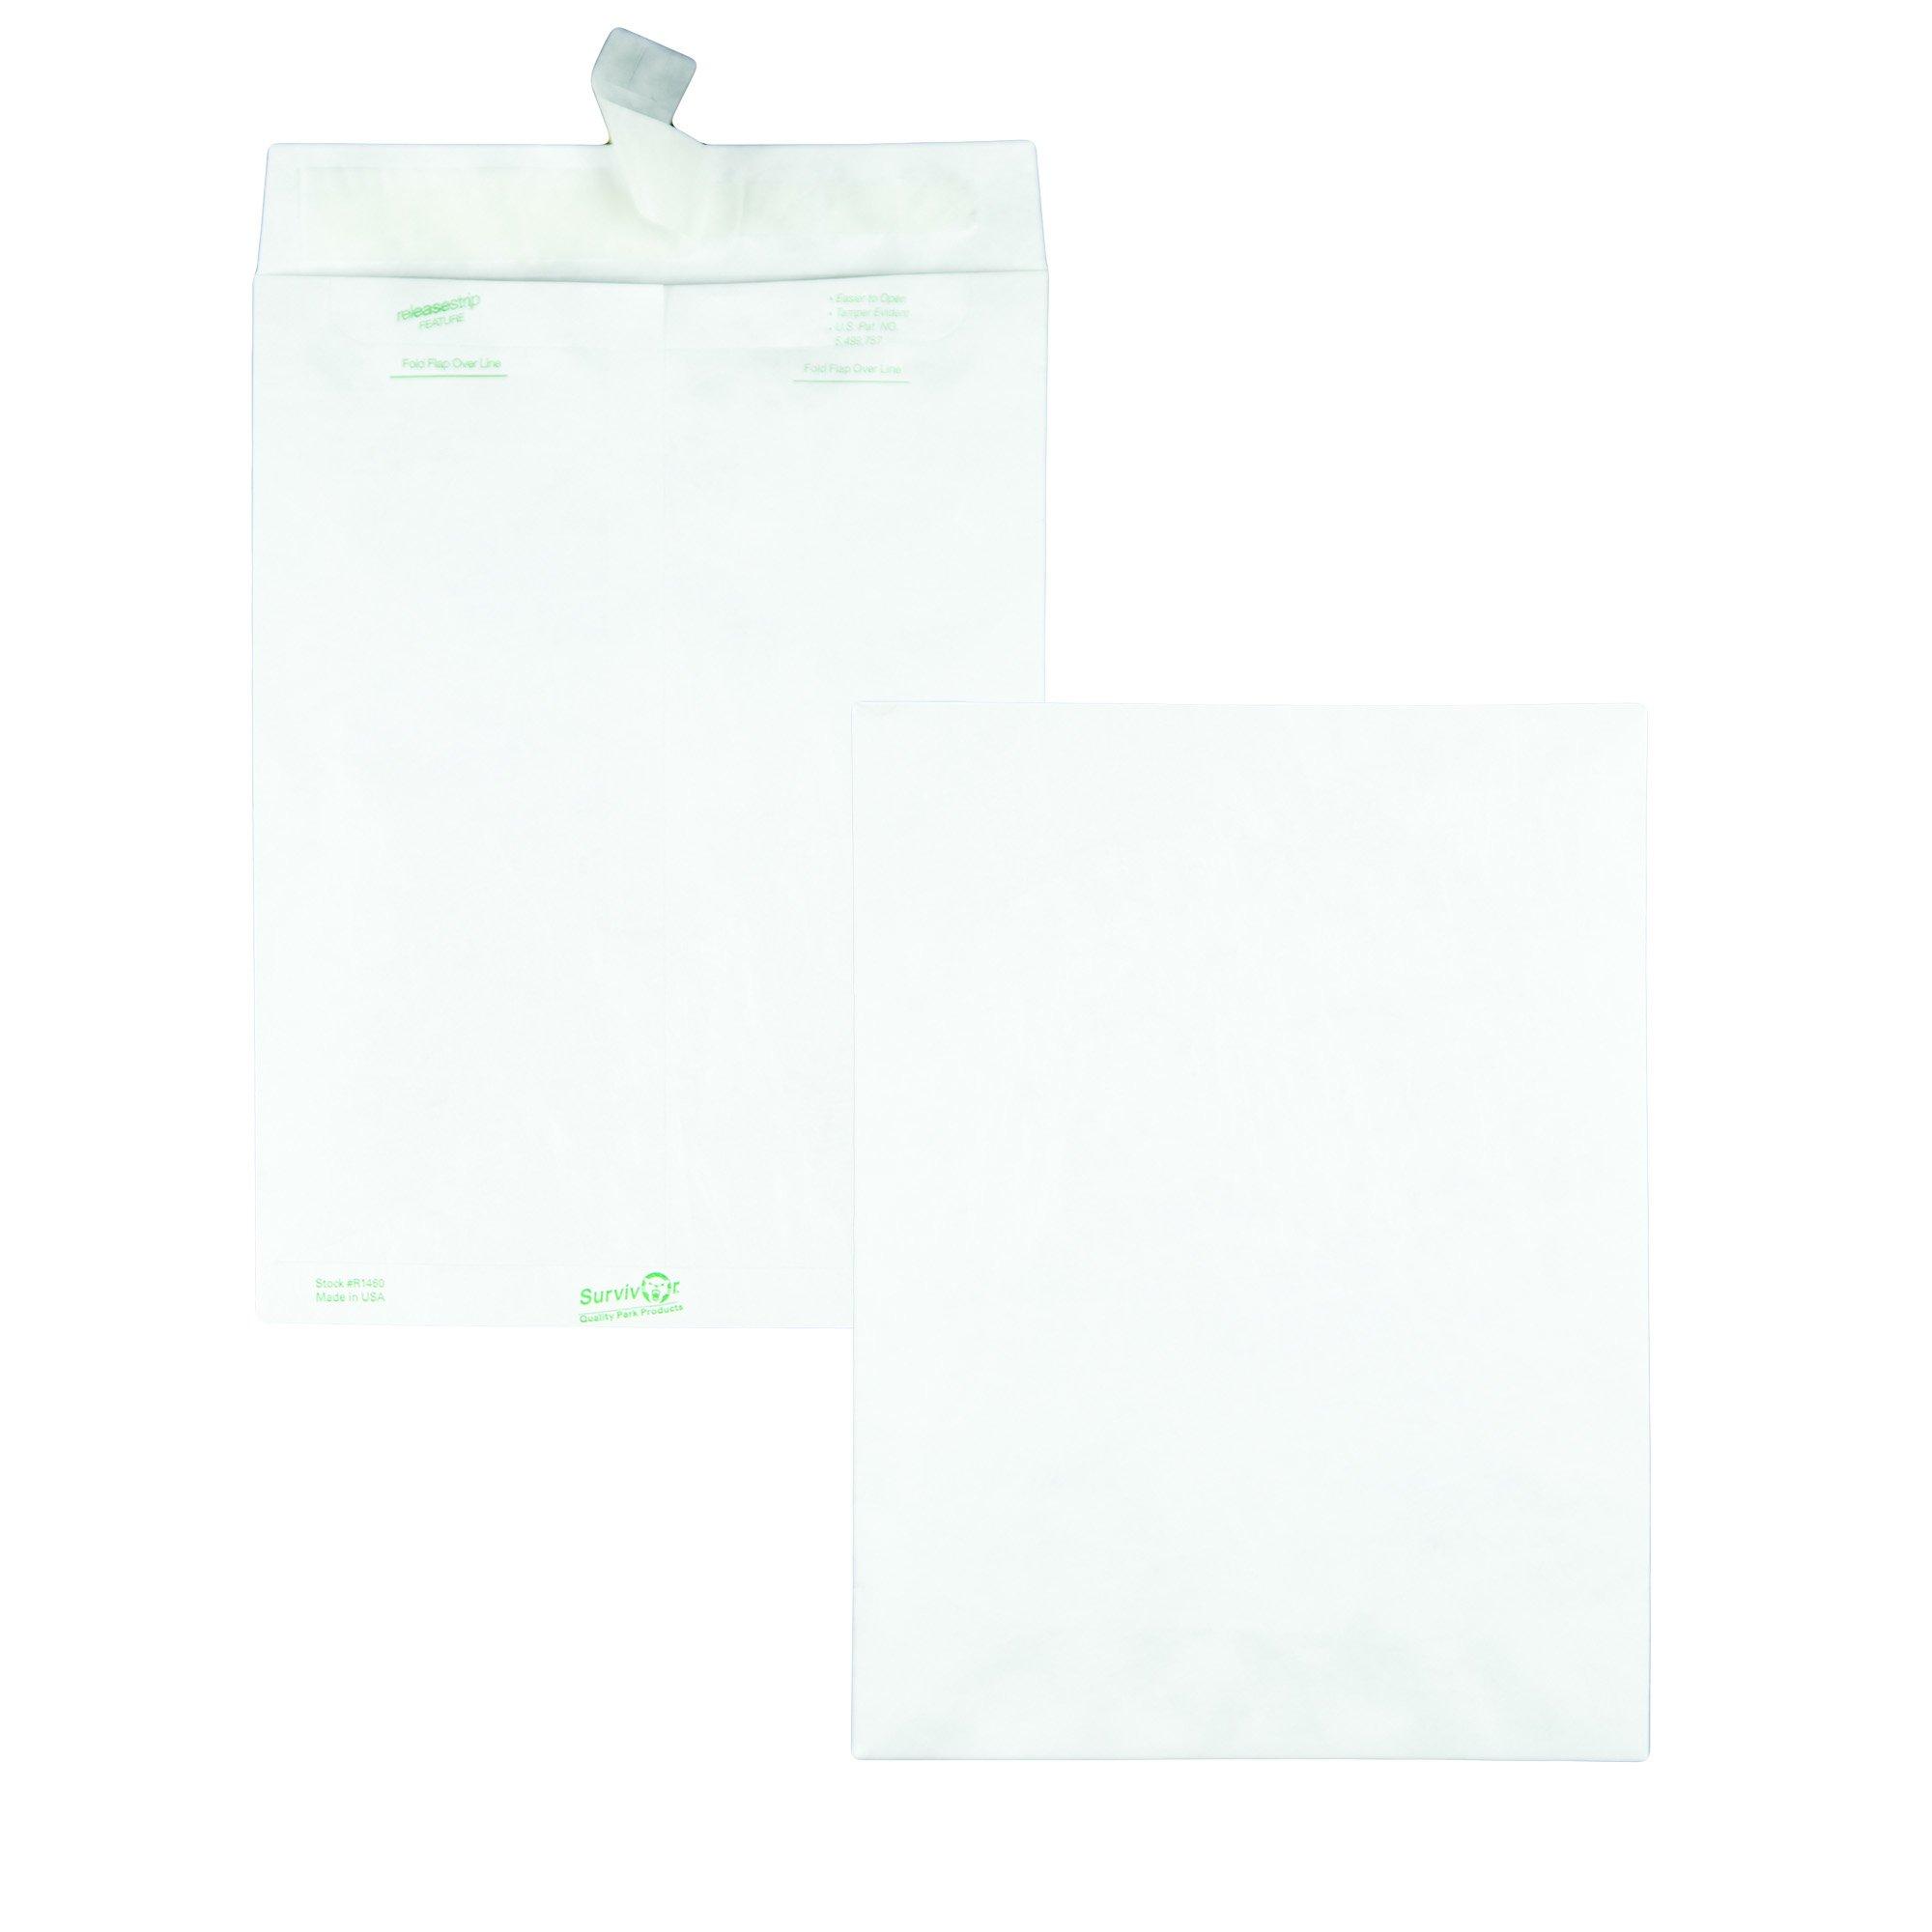 Quality Park Survivor R1460 Tyvek Mailer, 9 x 12, White (Box of 100) by Quality Park (Image #2)